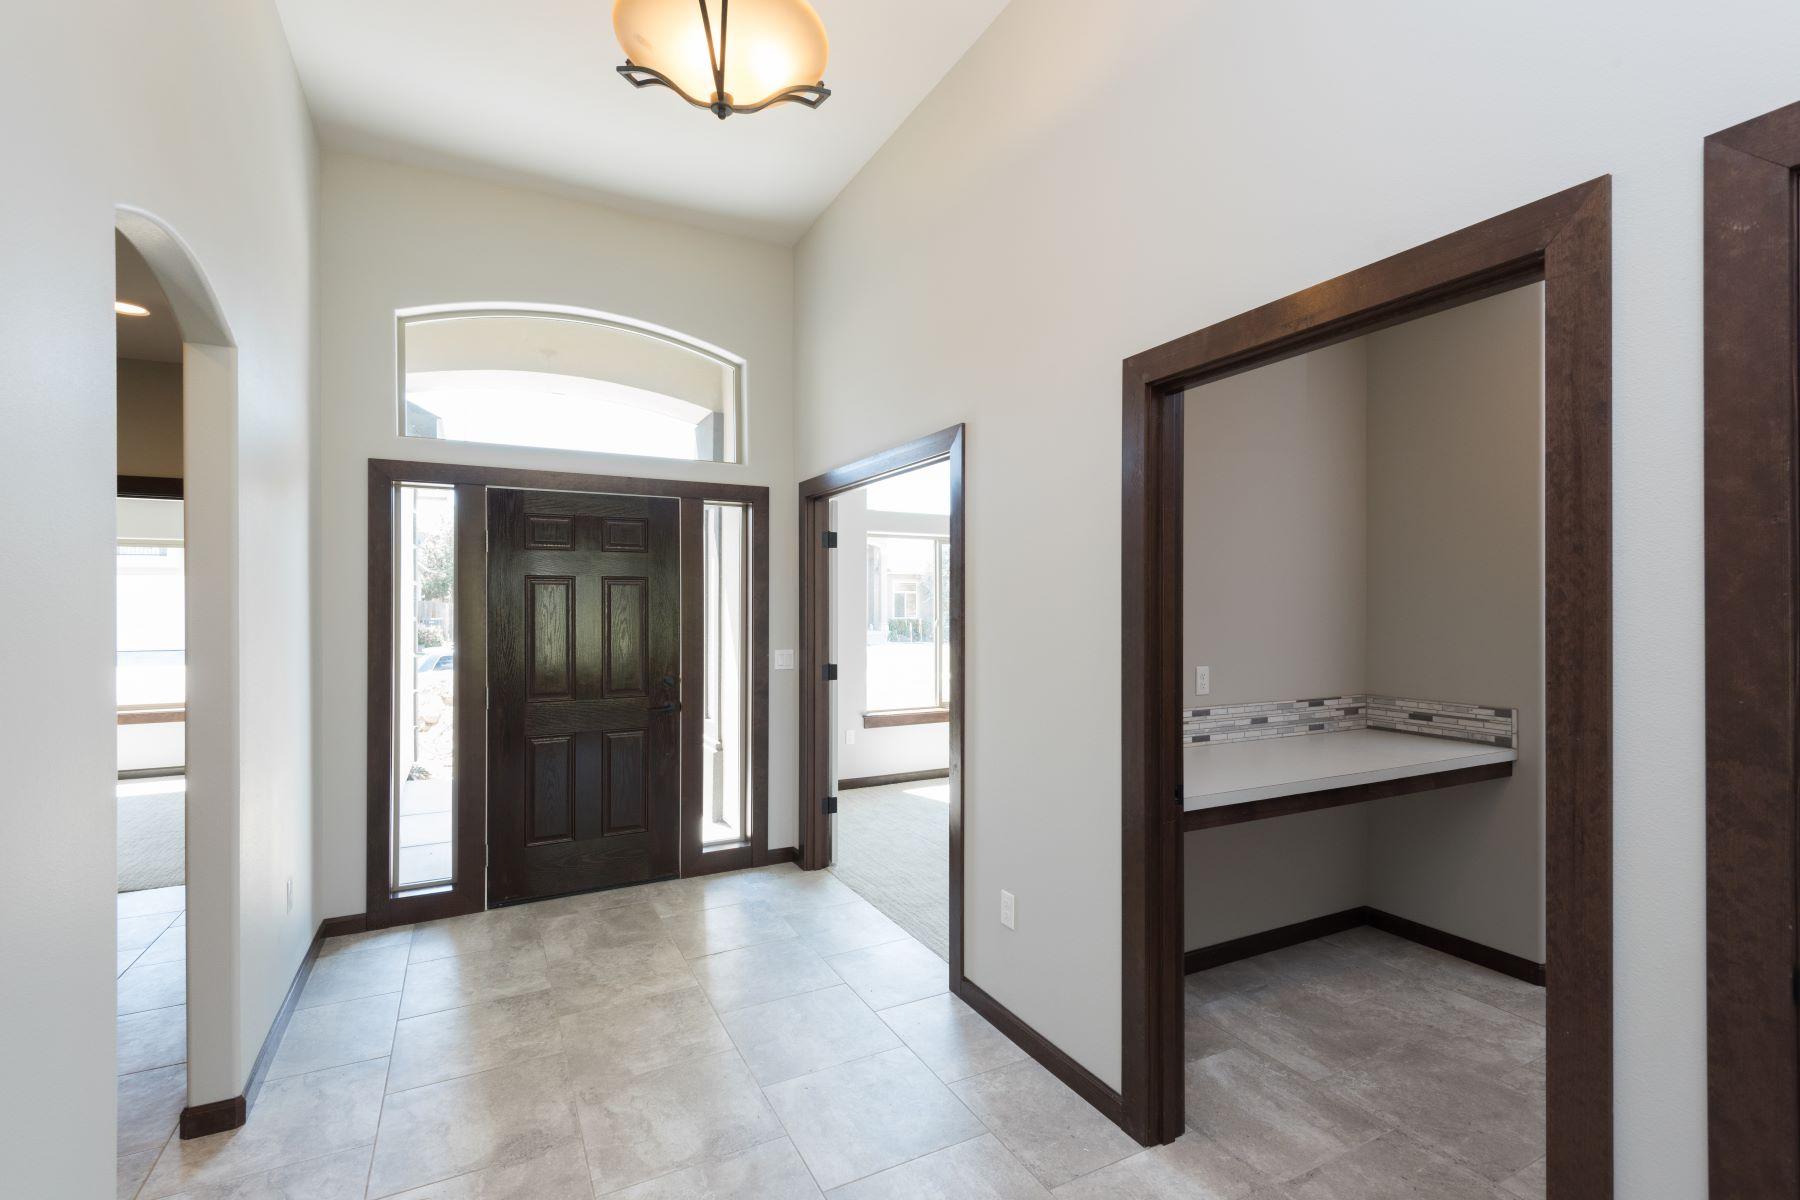 واحد منزل الأسرة للـ Sale في New 1 Story, 4 Bedroom, 2 bath Split Bedroom, Stucco Home 6616 West 38th Avenue, Kennewick, Washington, 99338 United States